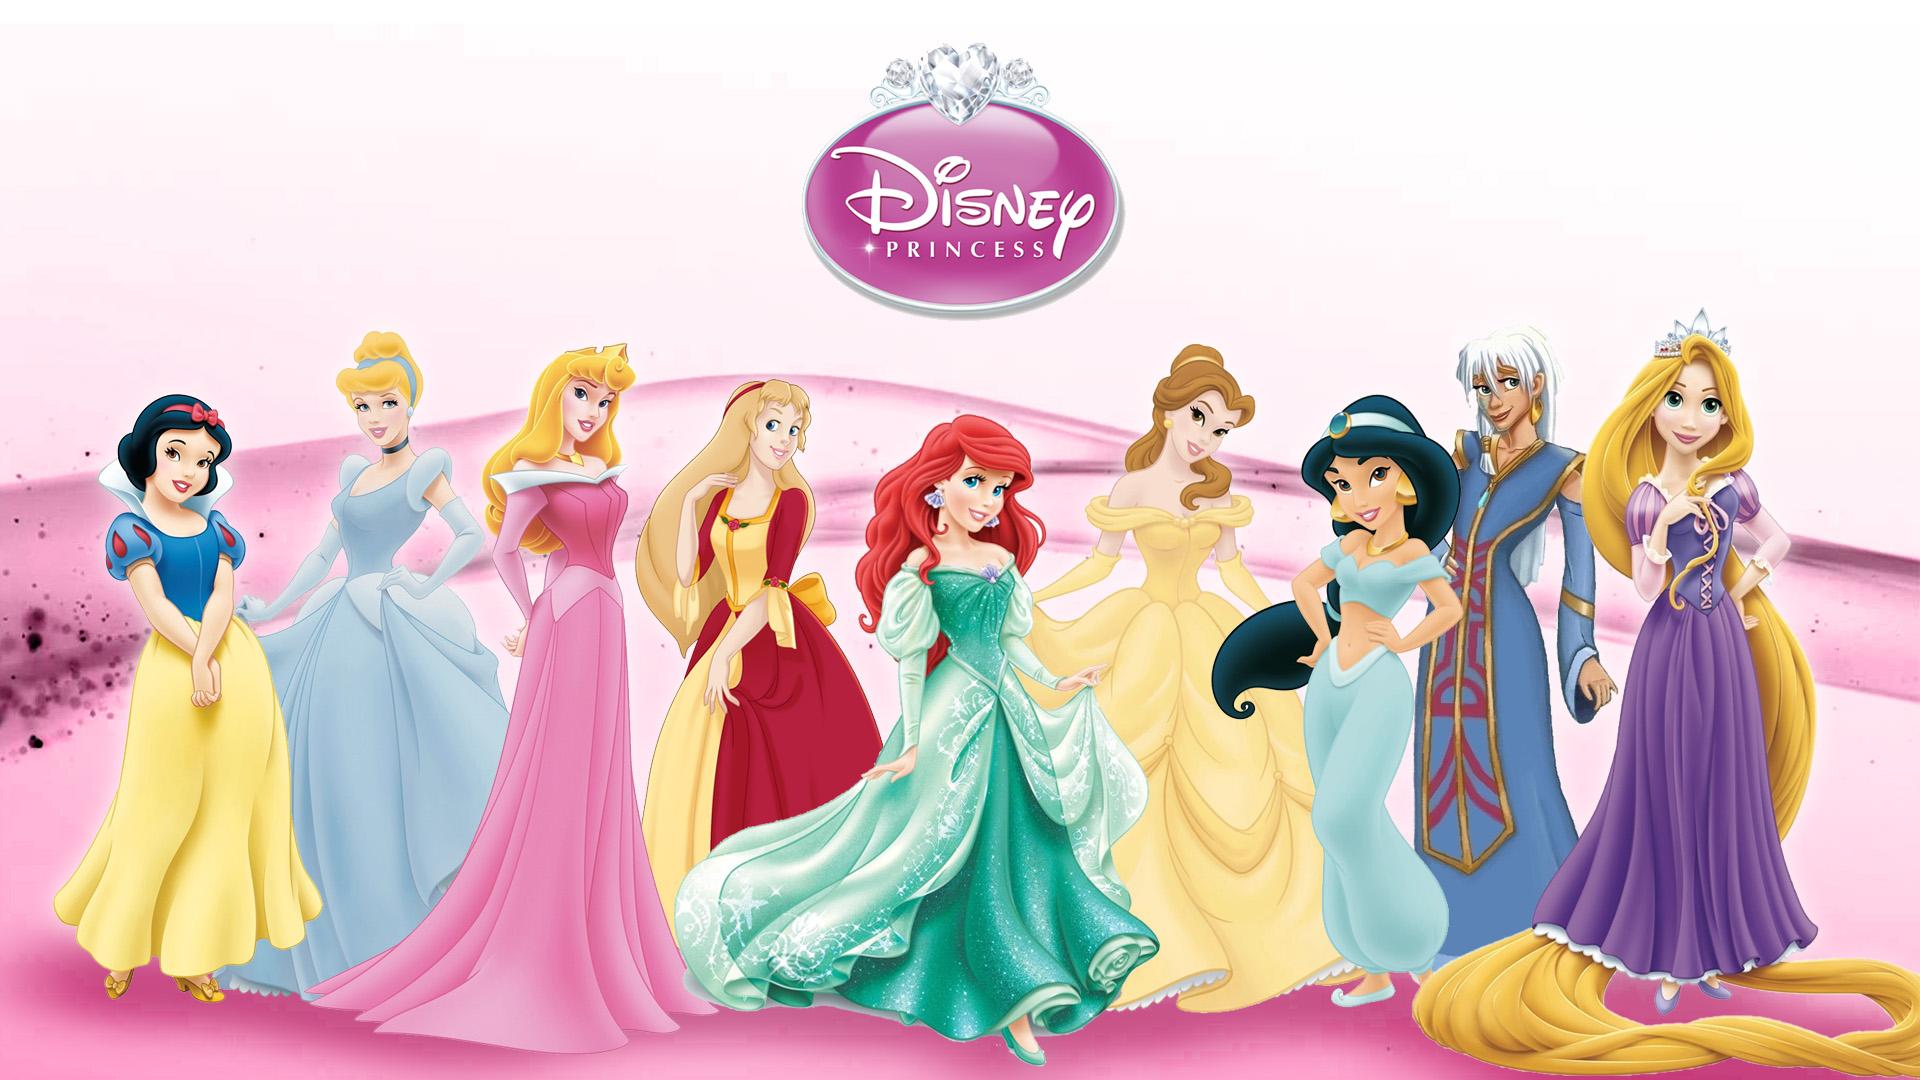 Anime Cellphone Wallpaper Latest Disney Princess Wallpaper Hd Media File